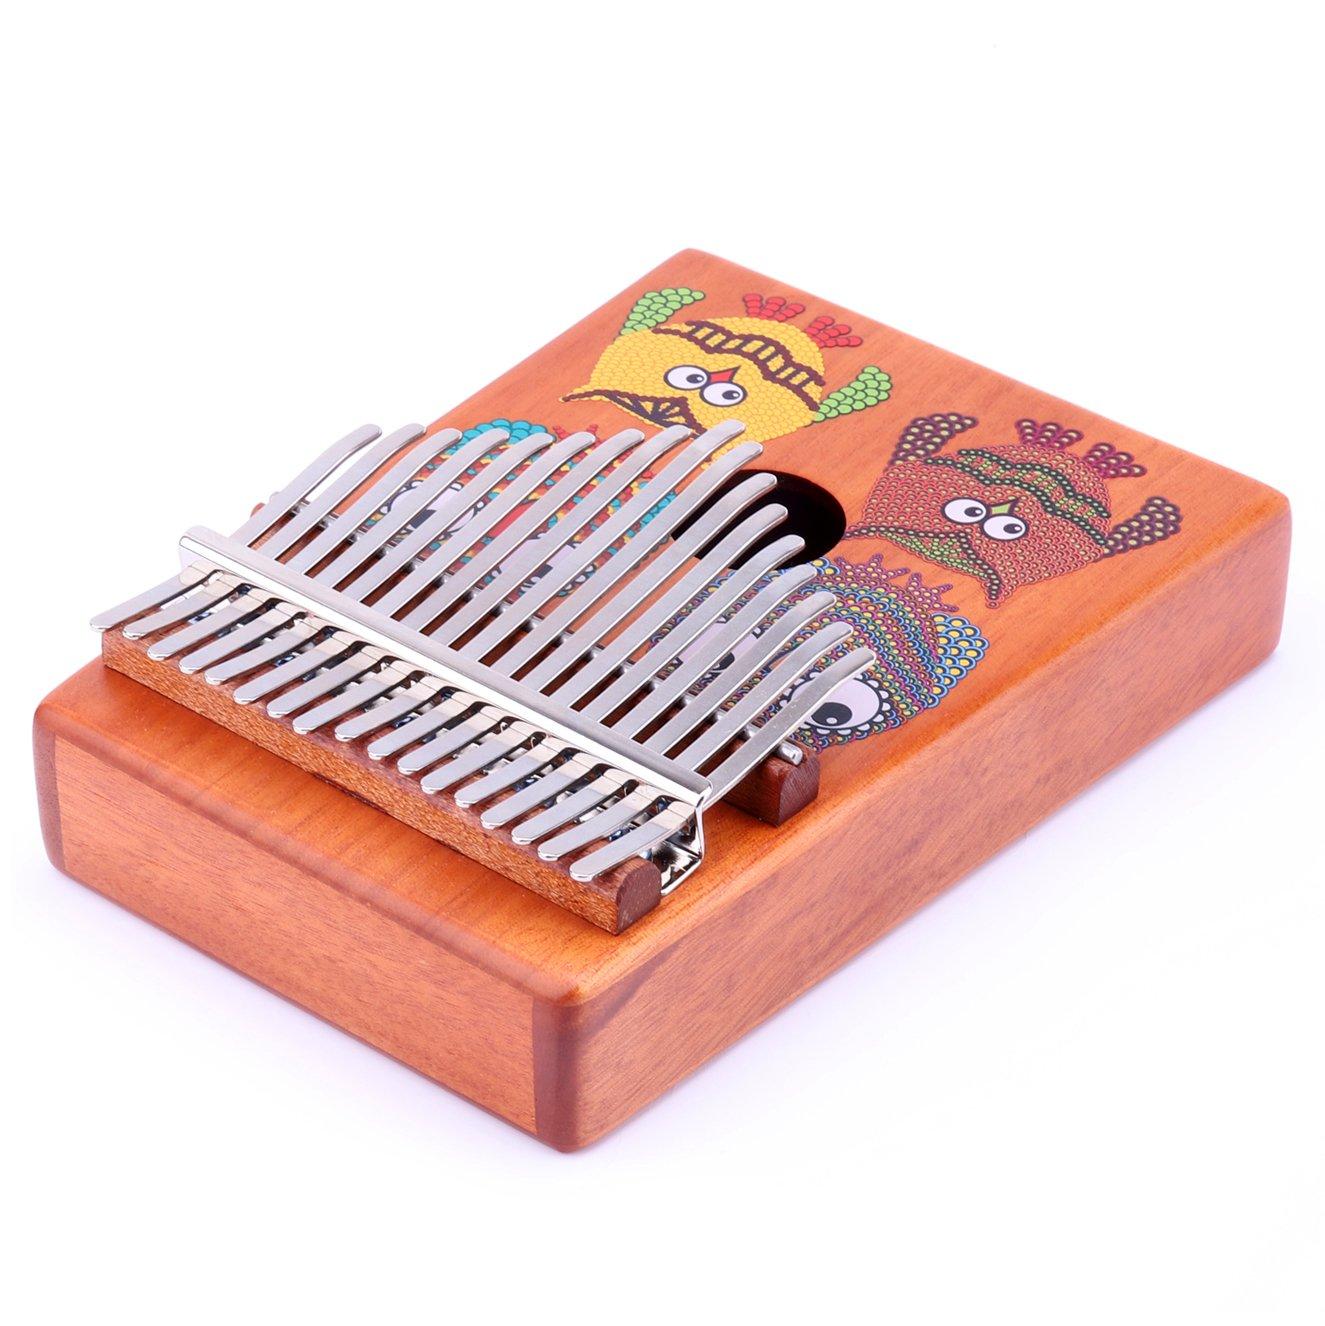 VI VICTORY 17 Key Mahogany Kalimba Colorful African Thumb Piano Finger Percussion Keyboard Music Instruments - Owl by VI VICTORY (Image #4)